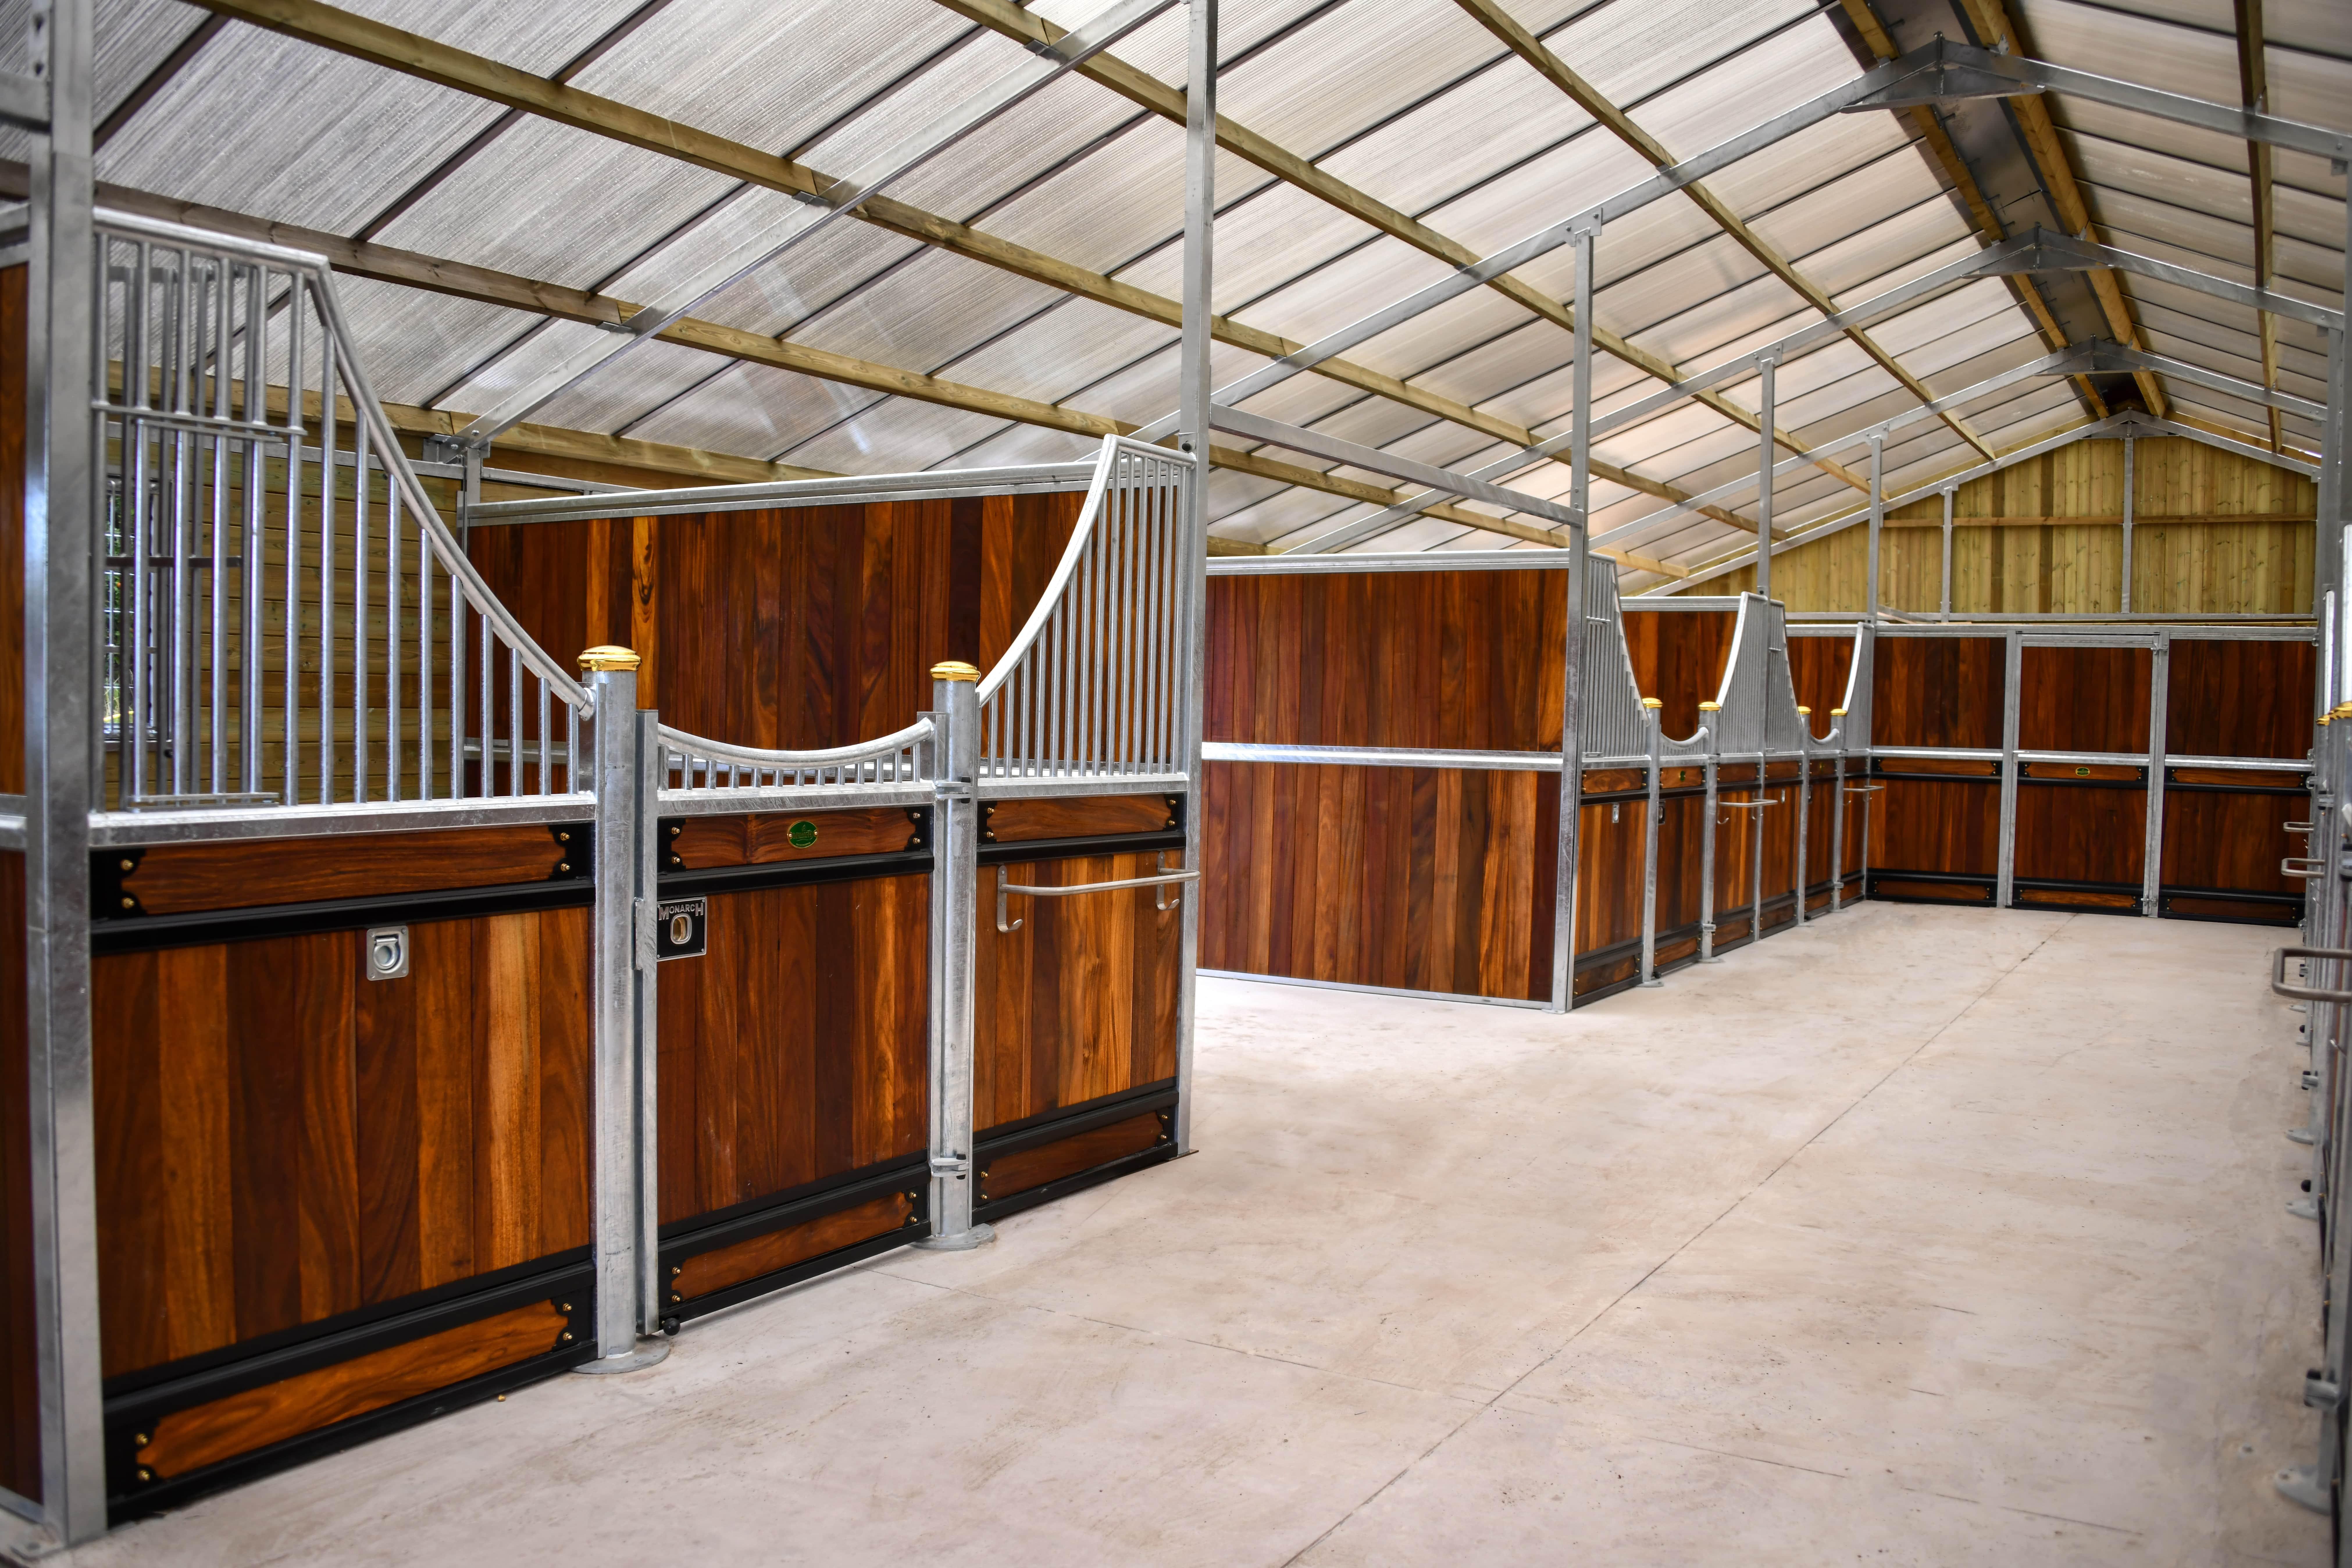 Standard Size Majestic Victorian Hardwood Stables Inside a Monarch Barn